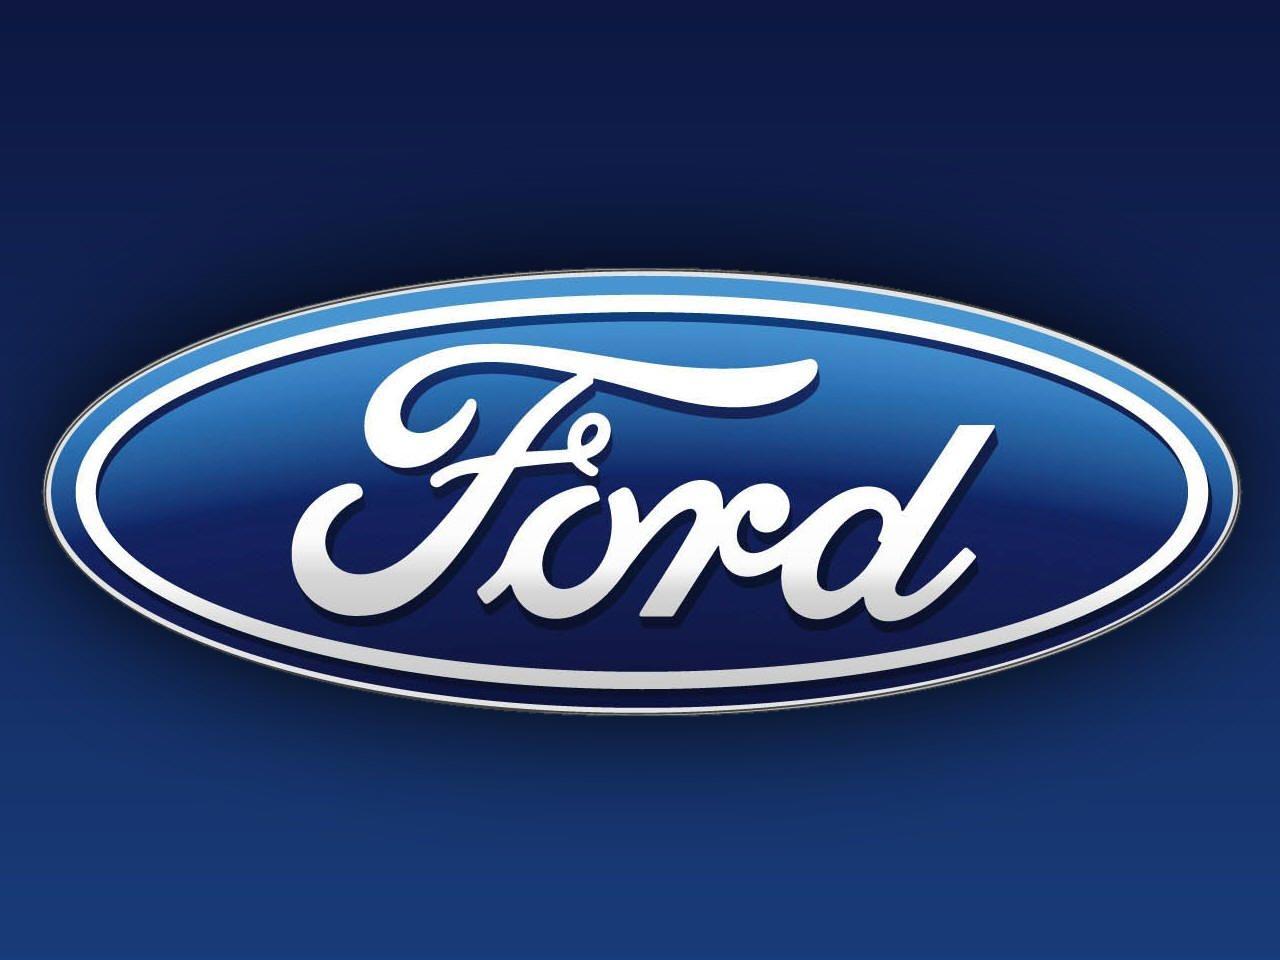 Ford Motor Stereo Headphones Vtg Detroit Motor Company Hi Fi Auto